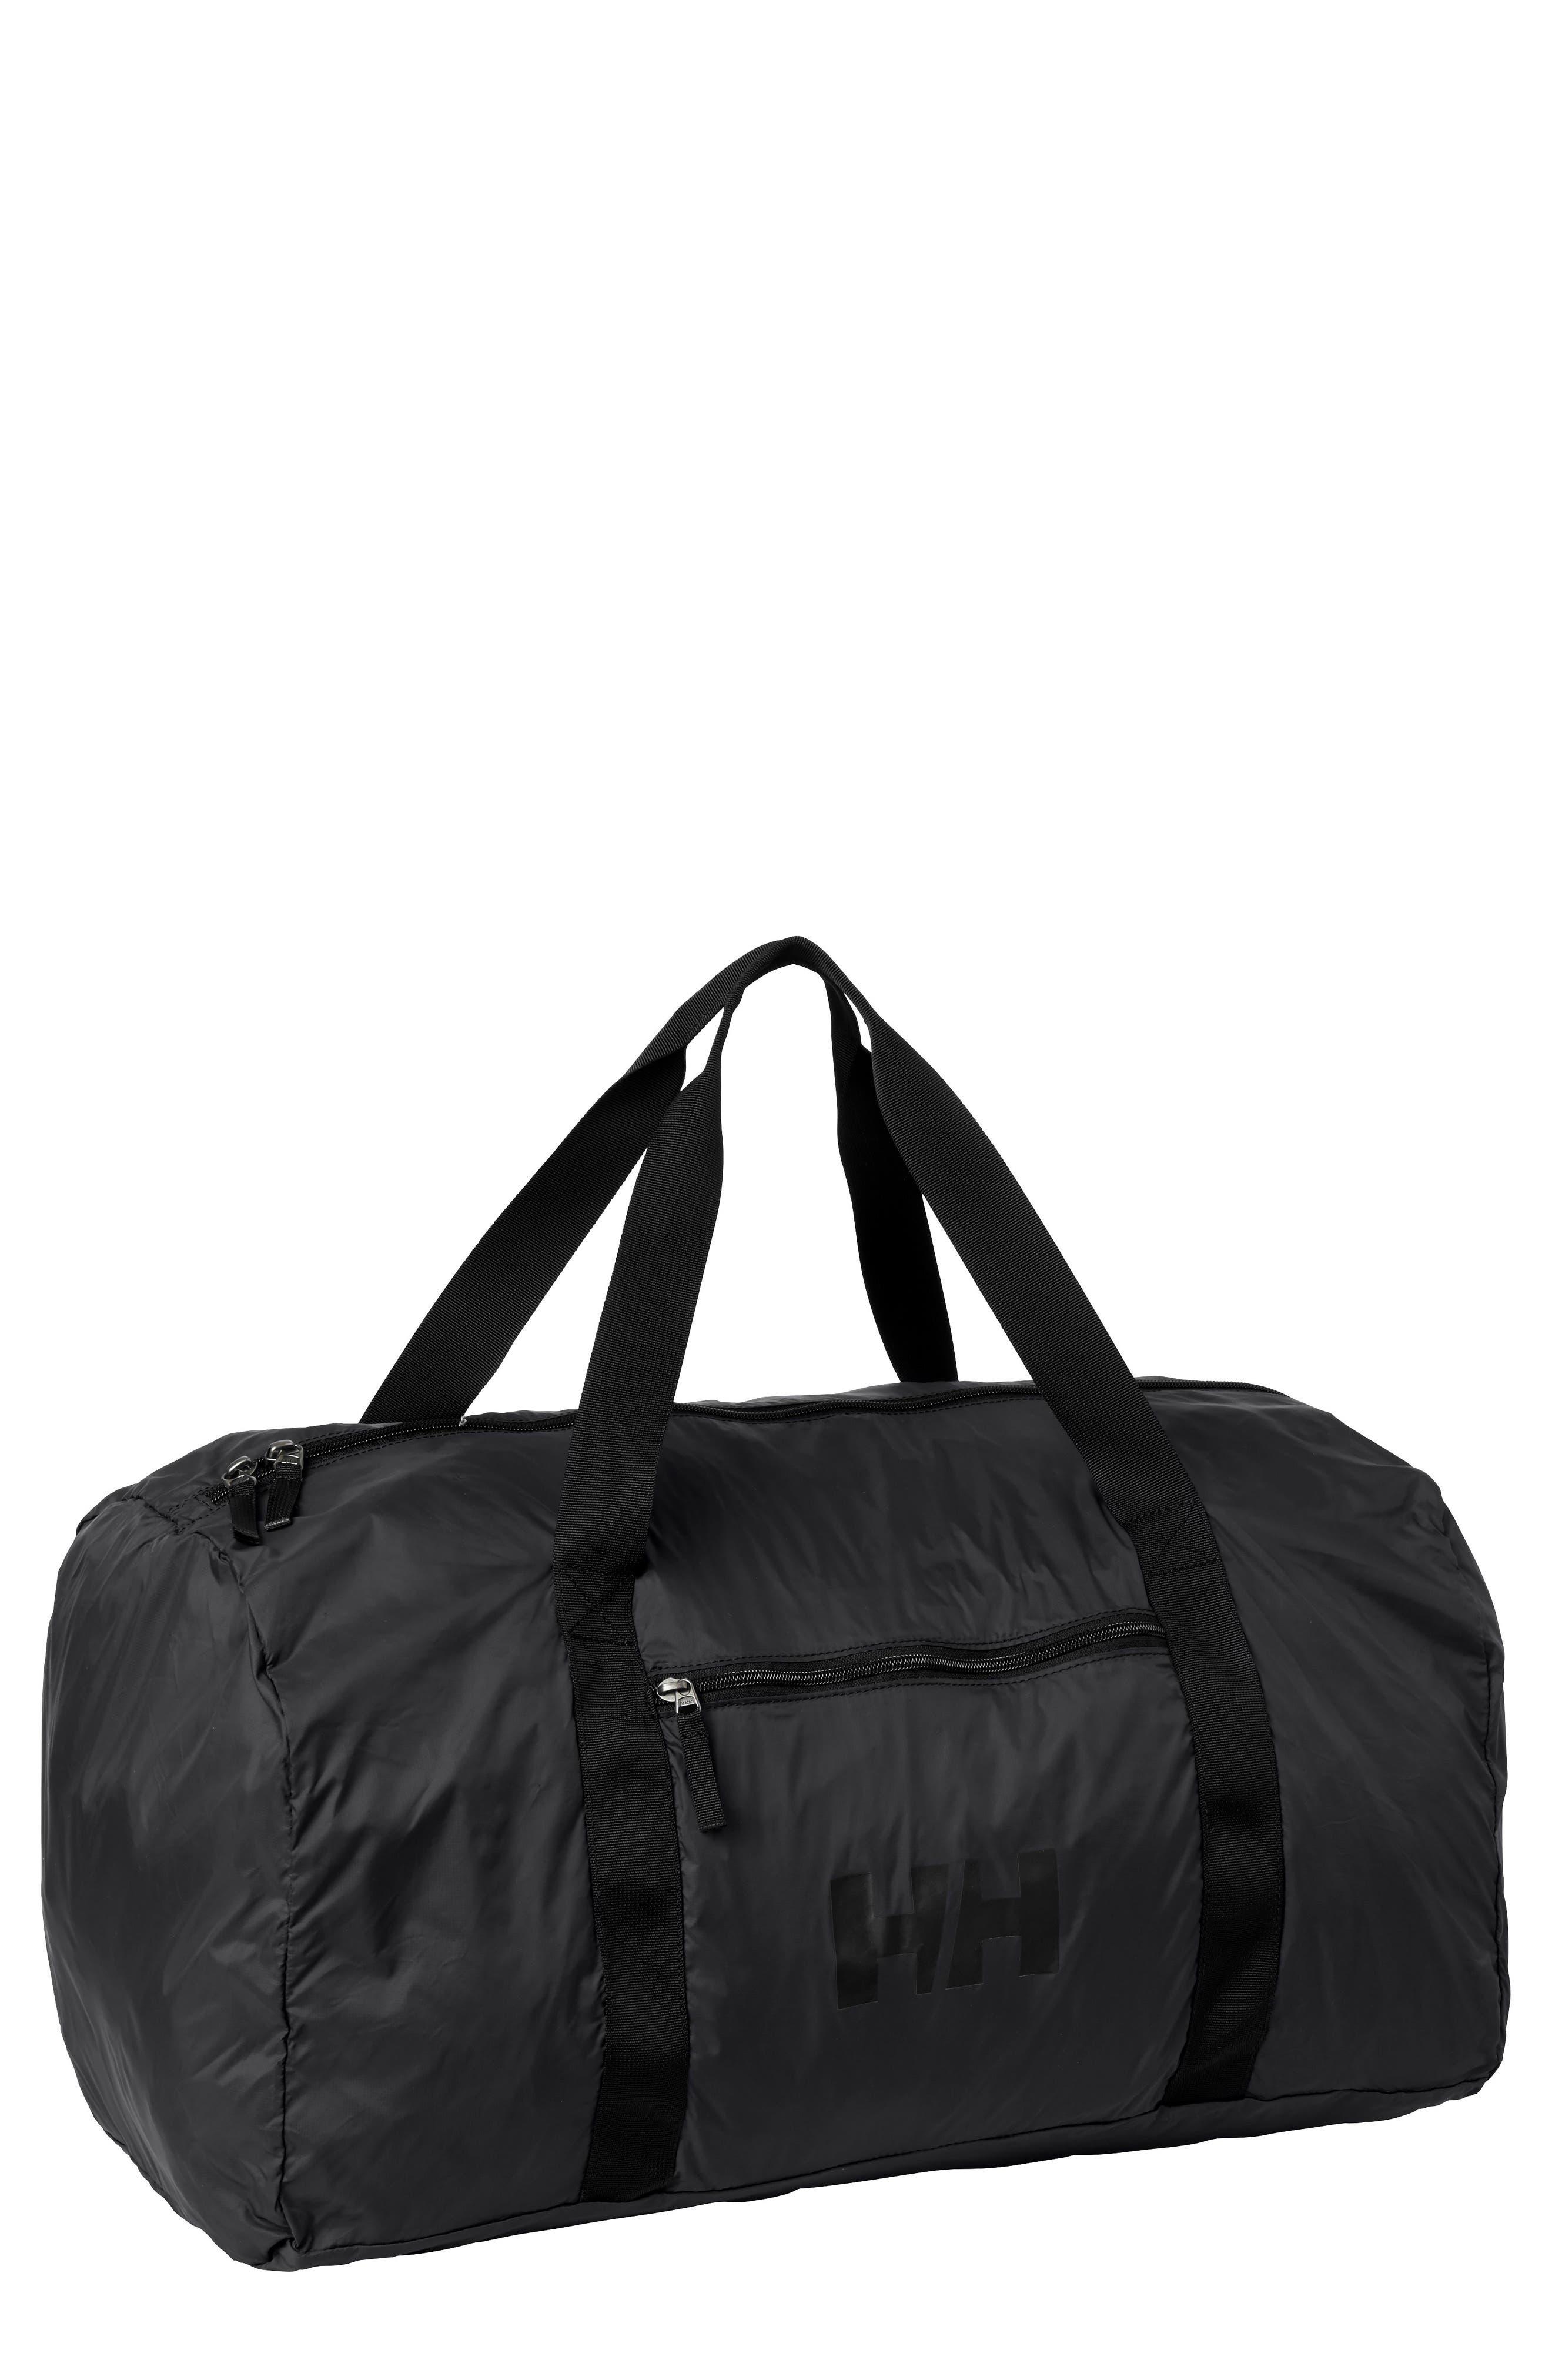 Small Packable Duffel Bag,                         Main,                         color, Black